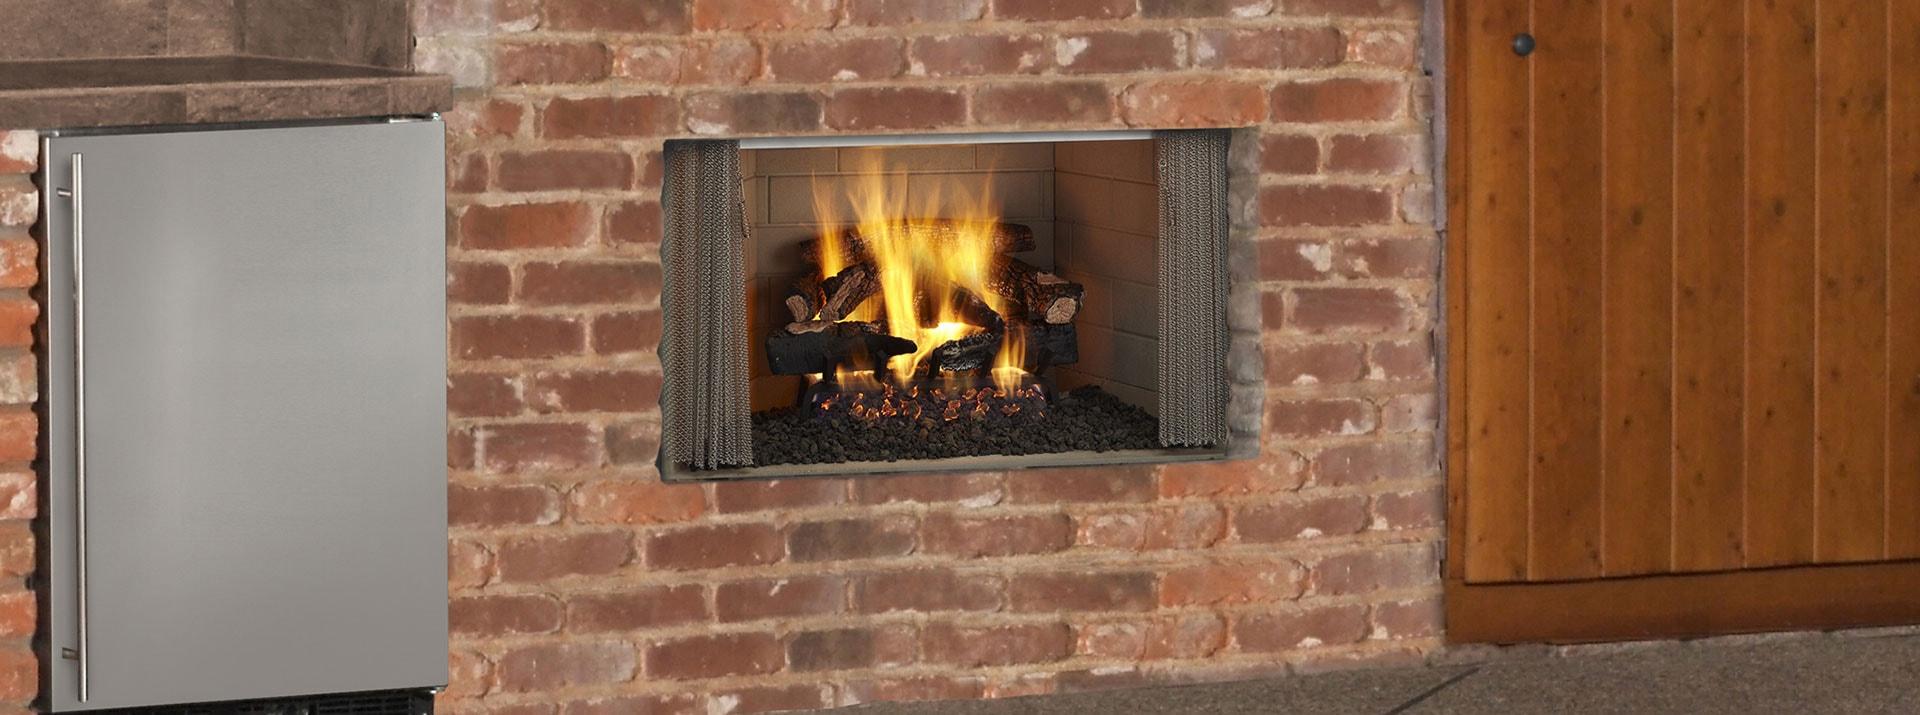 Villawood Wood Burning Outdoor Fireplace Monessen Hearth